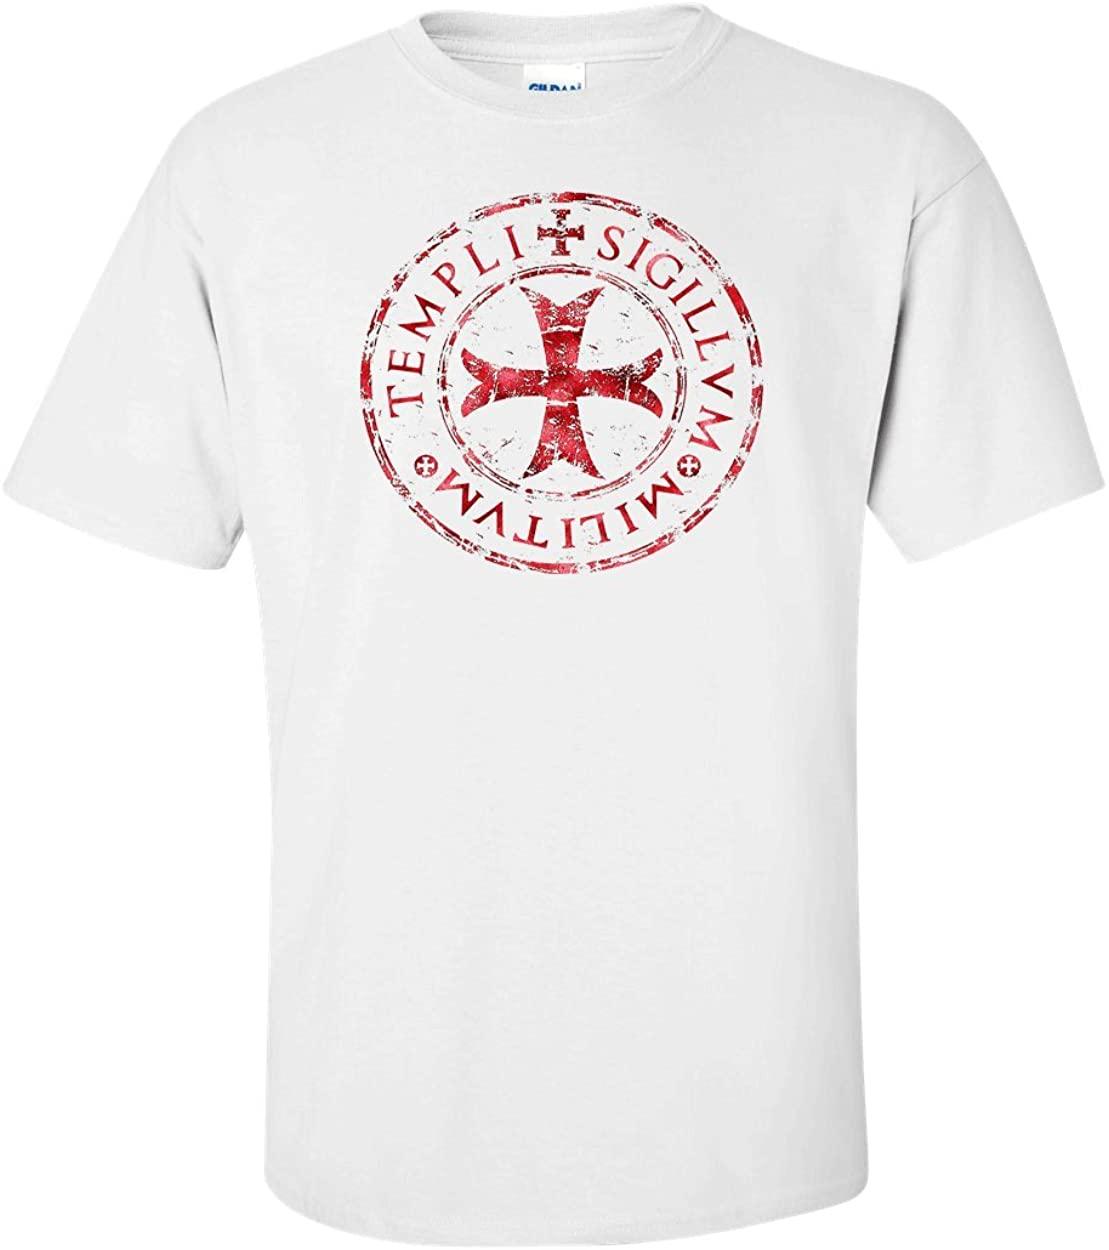 Variation TEMPLARDES1TW2X of Logoz USA Knights Templar T Shirt Templi Sigillvm Militvm B00U7U42YI 2572